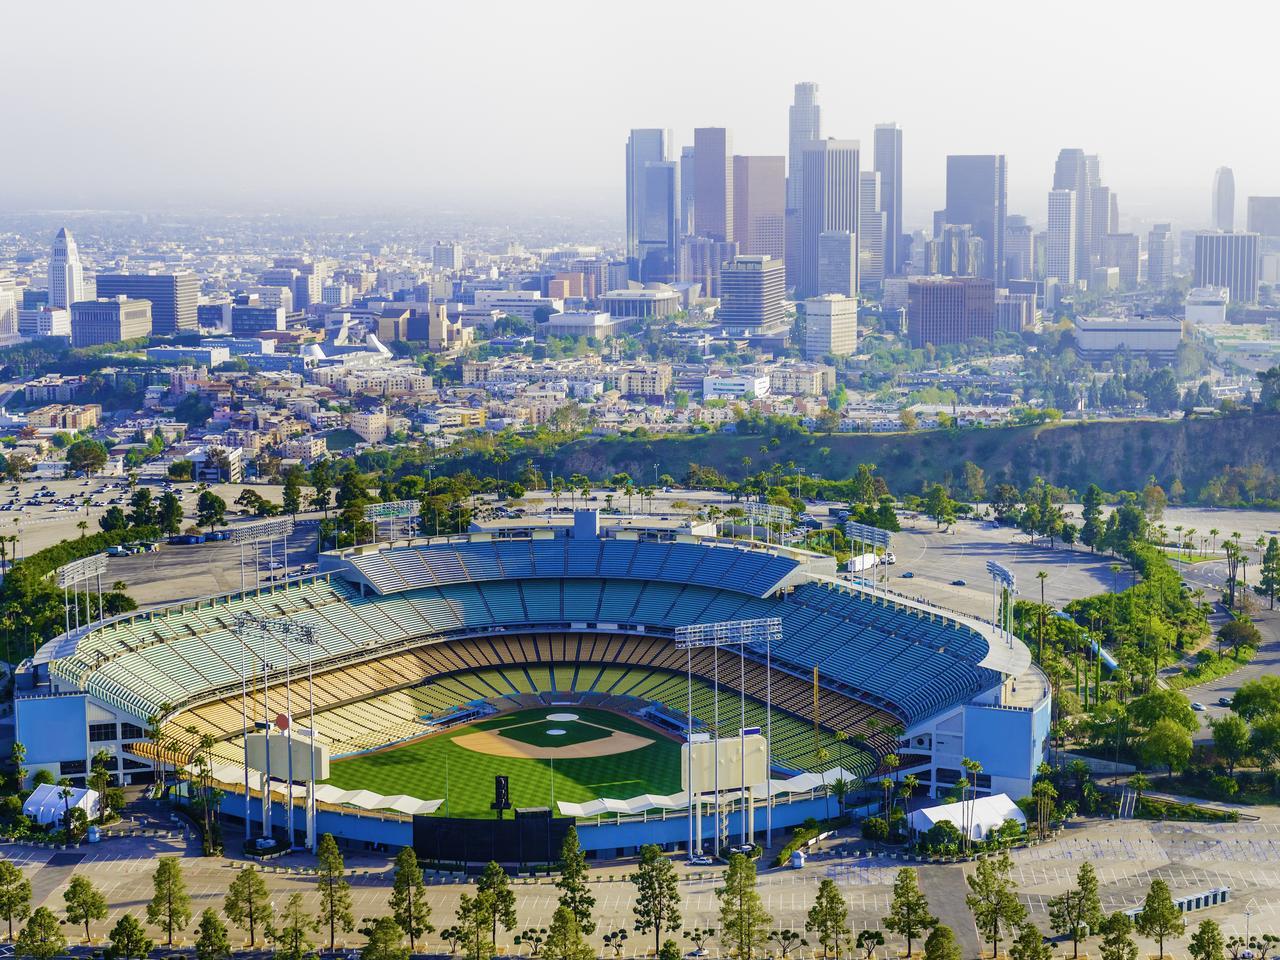 Panoramic Aerial of Los Angeles California